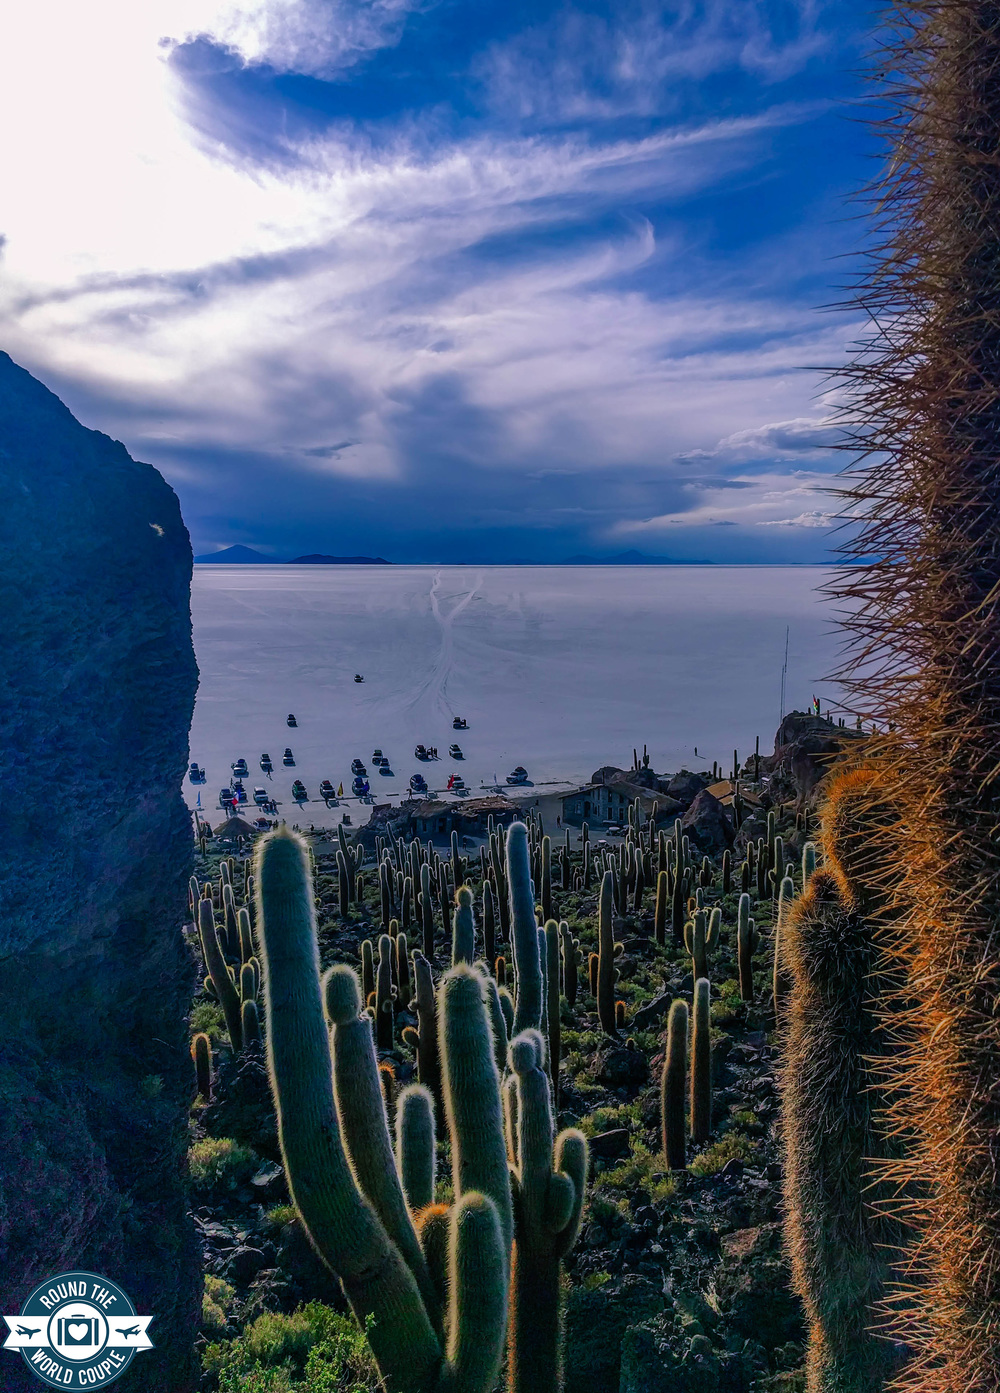 Salt Flats Cactus Island 4 (1 of 1).jpg